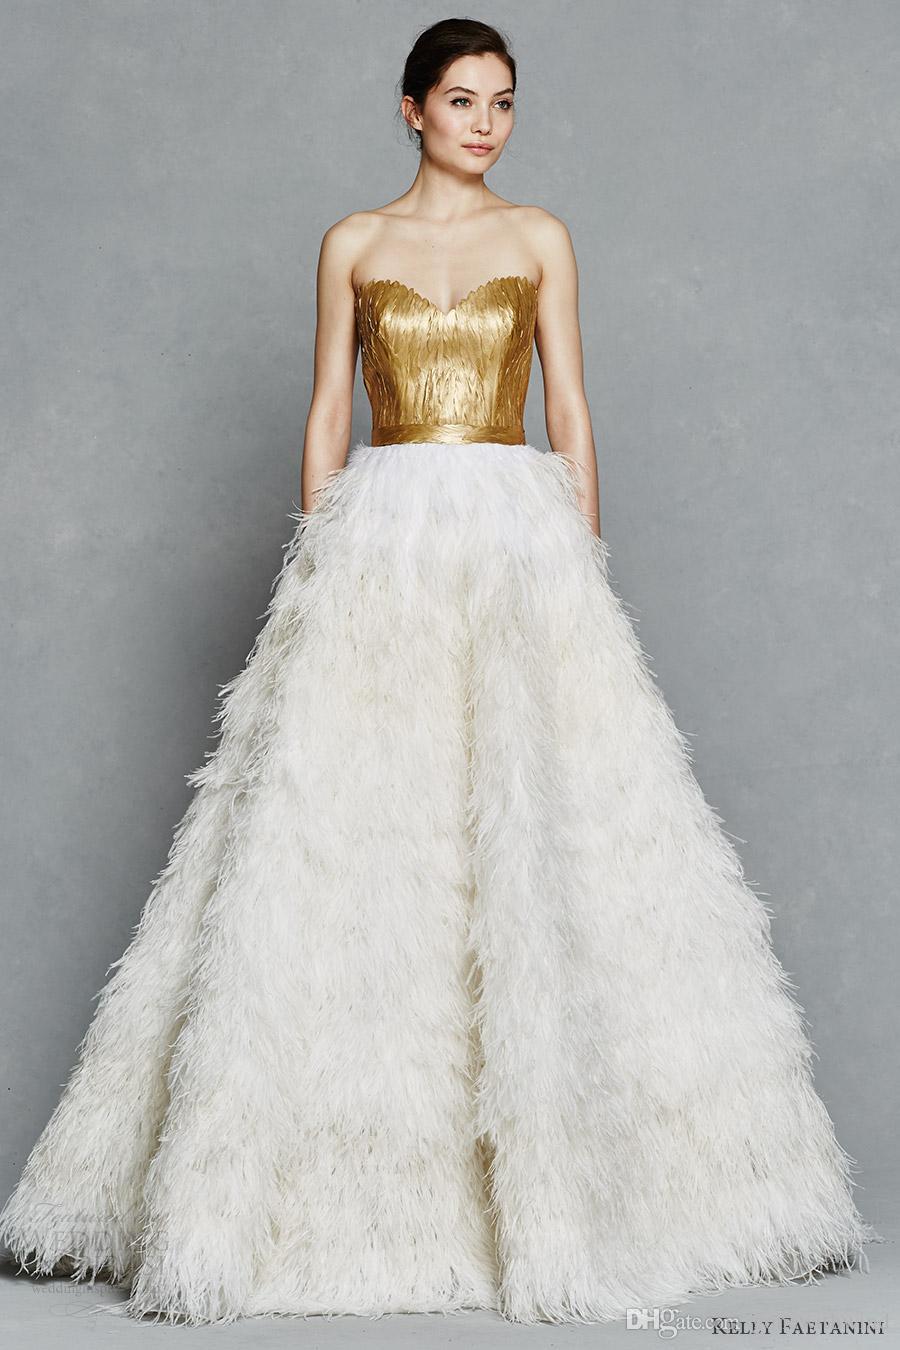 Feathered skirt wedding dress